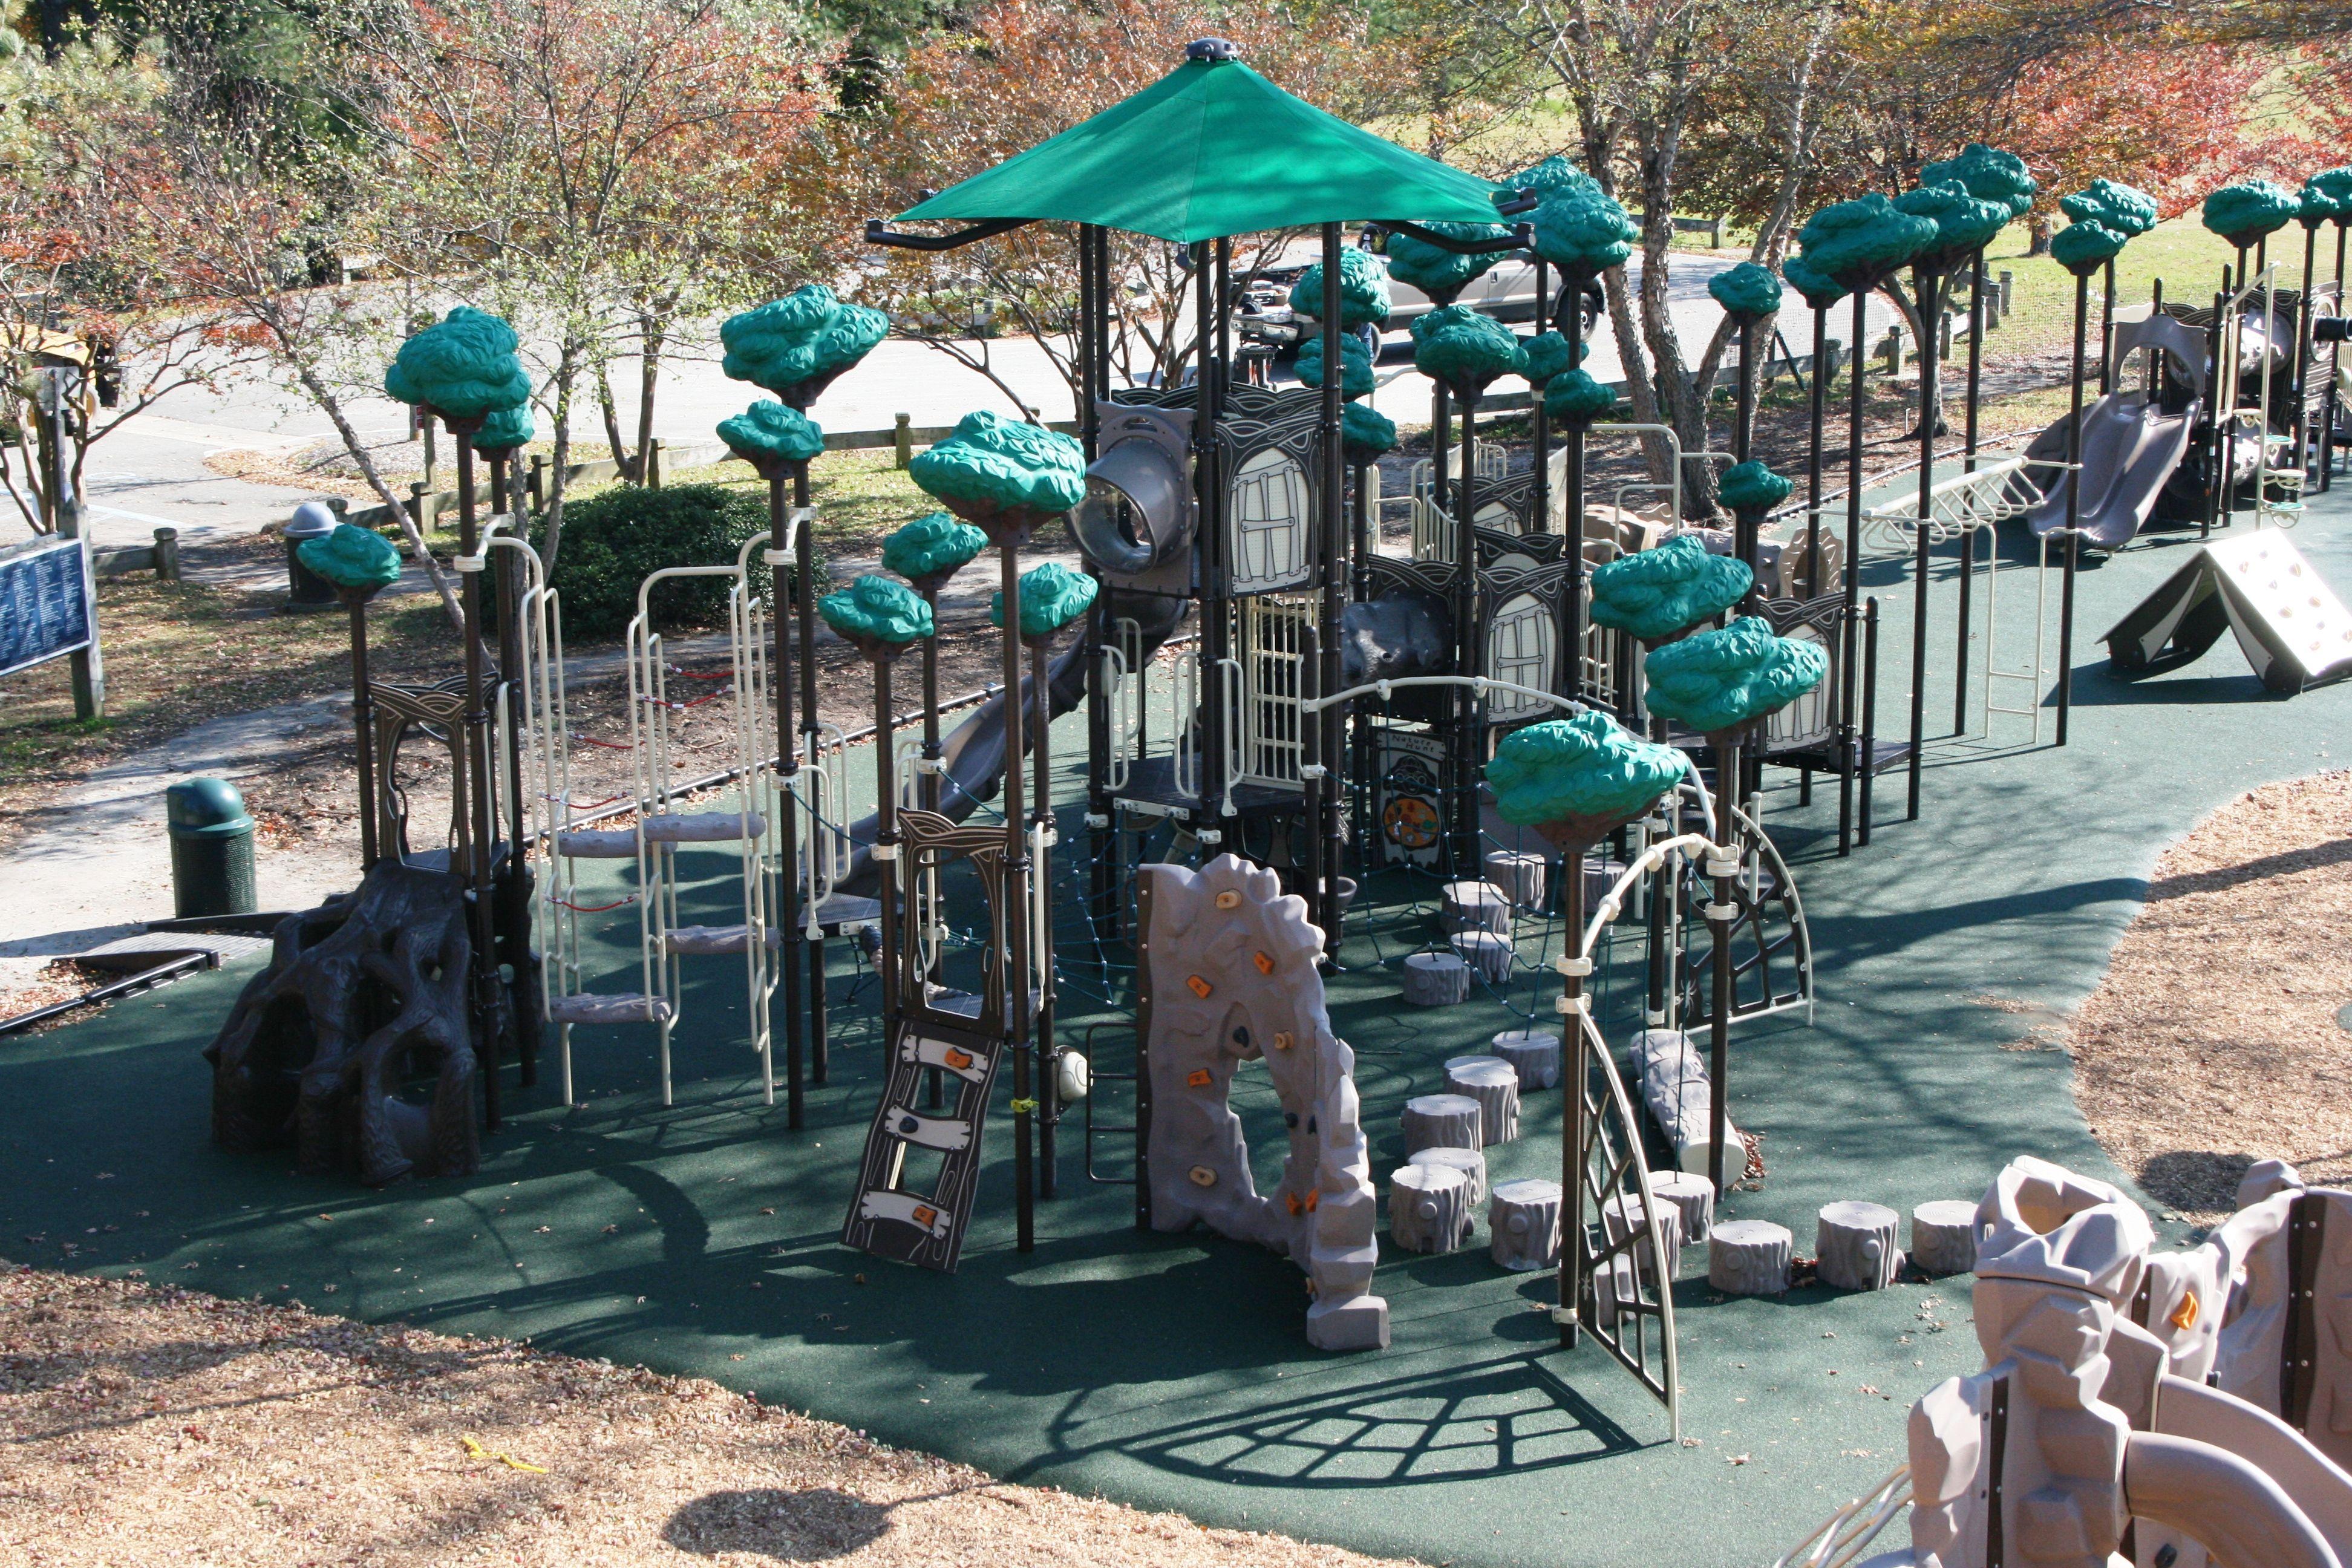 fort fun playground at huntington park in newport news va. Black Bedroom Furniture Sets. Home Design Ideas